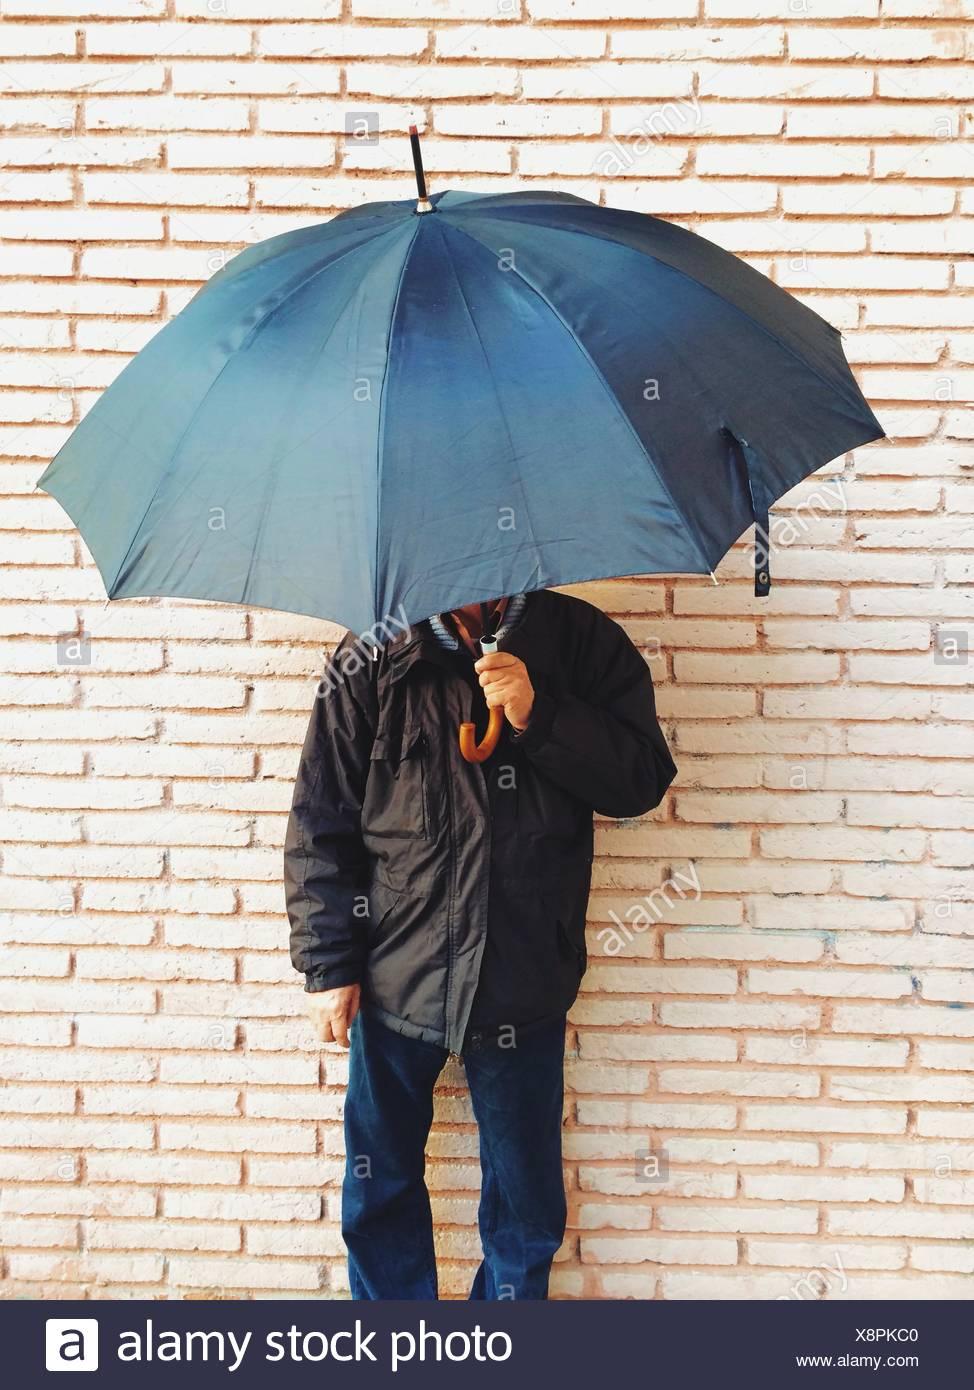 Reifer Mann mit Regenschirm gegen Mauer Stockbild